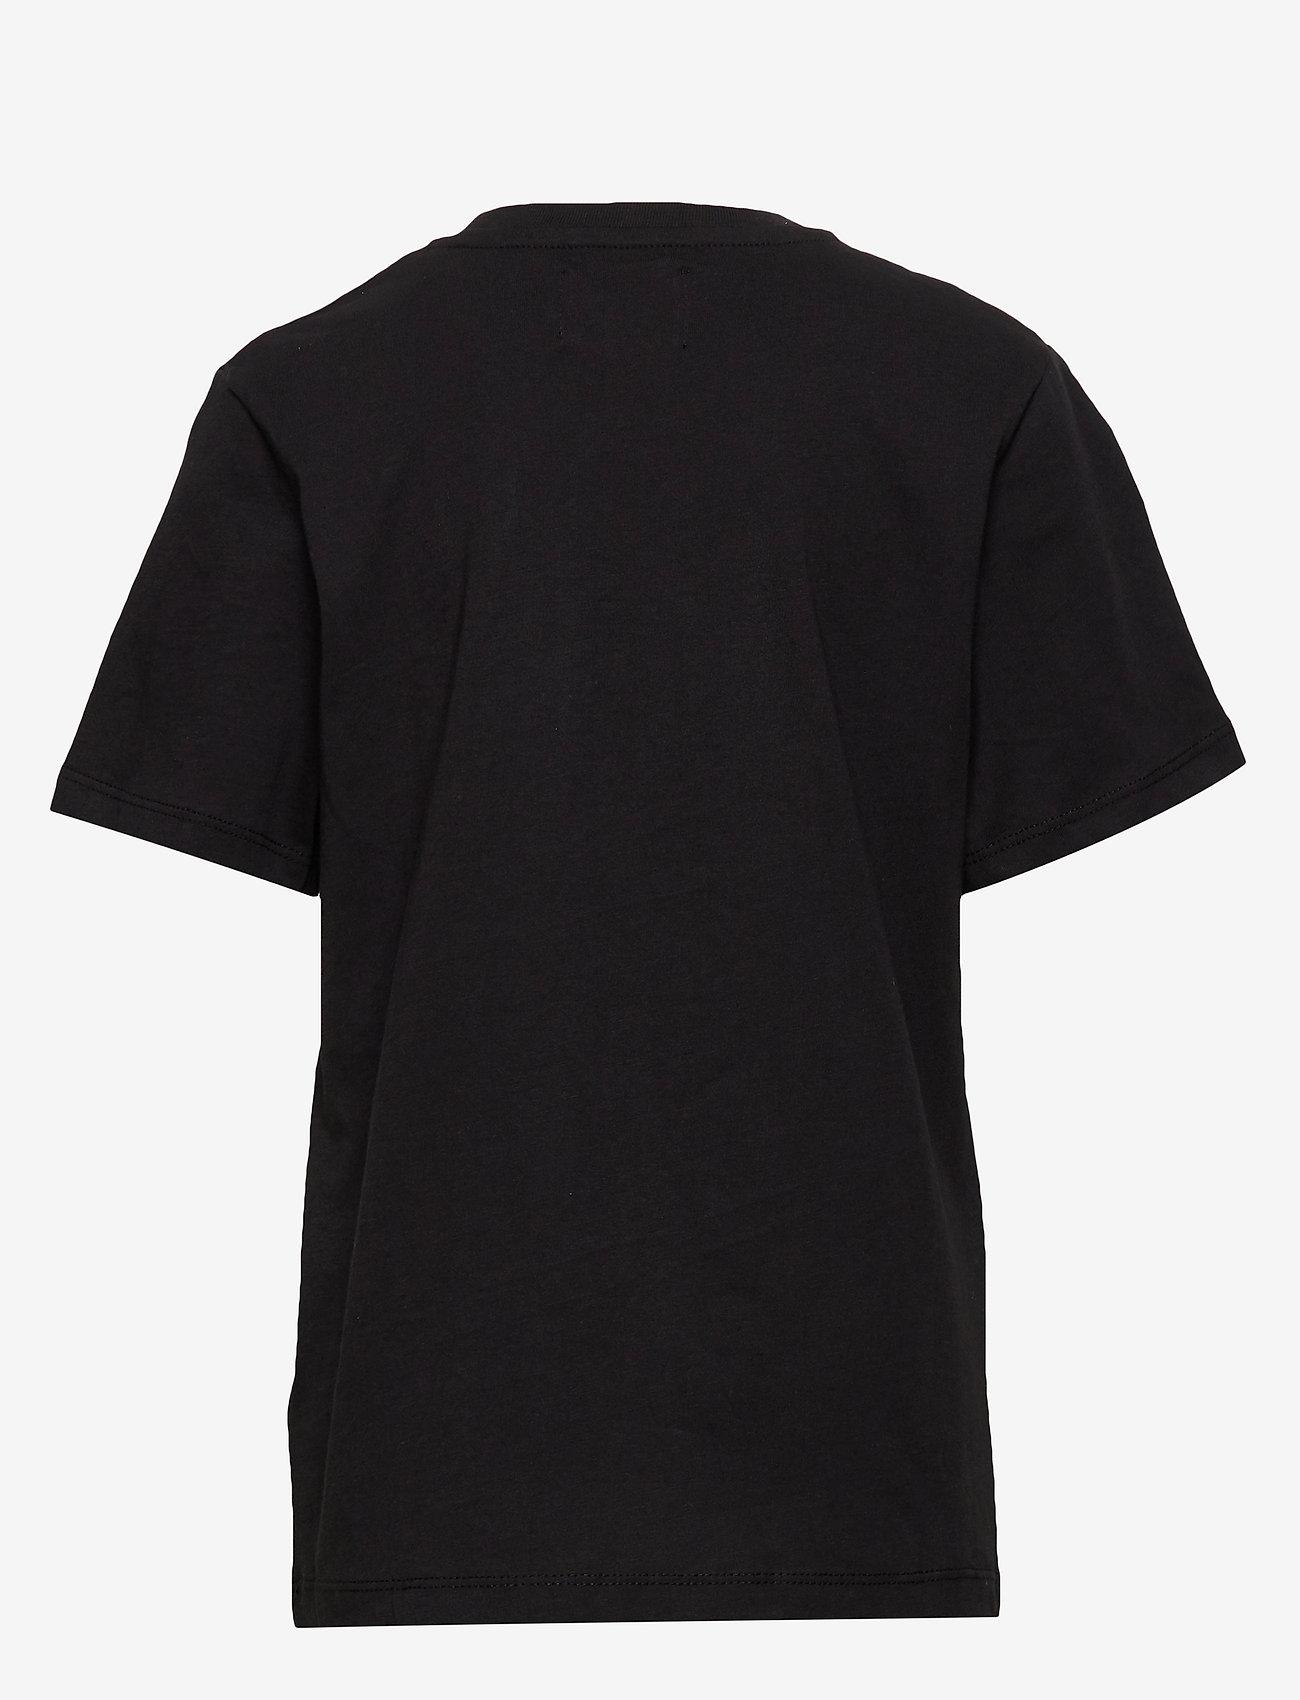 Calvin Klein - MONOGRAM LOGO T-SHIRT - korte mouwen - ck black - 1